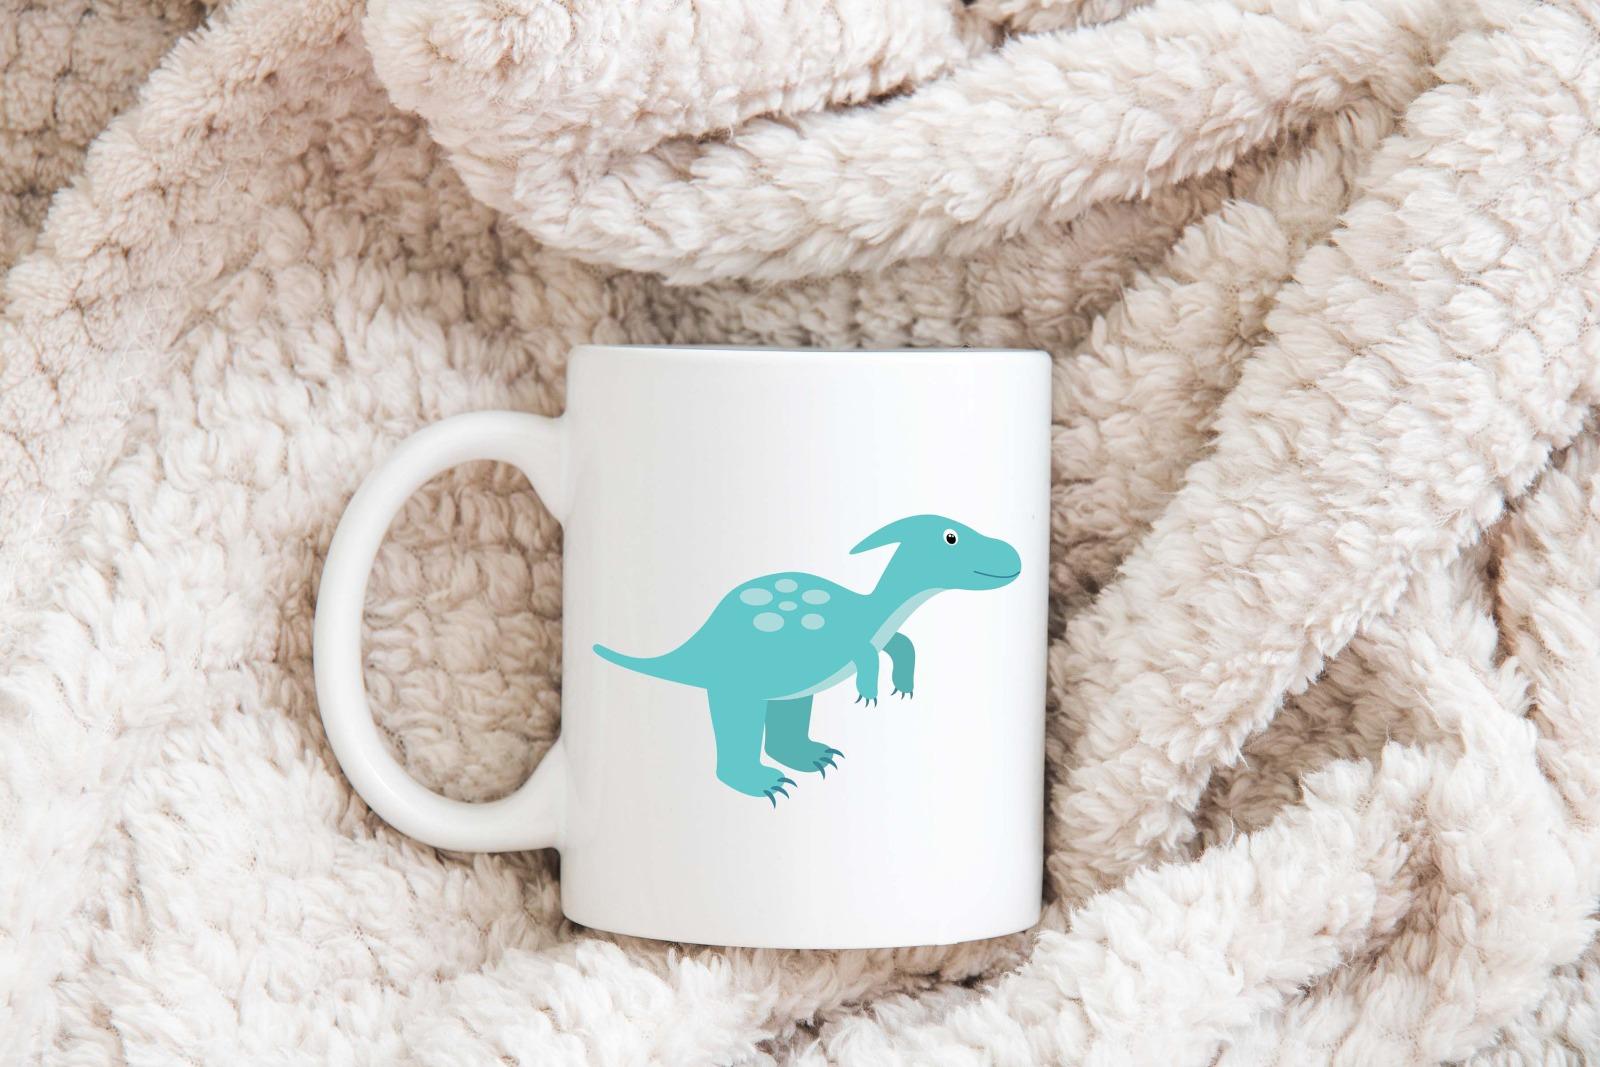 Tasse Dinosaurier-Look personalisiert mit Wunschname 5